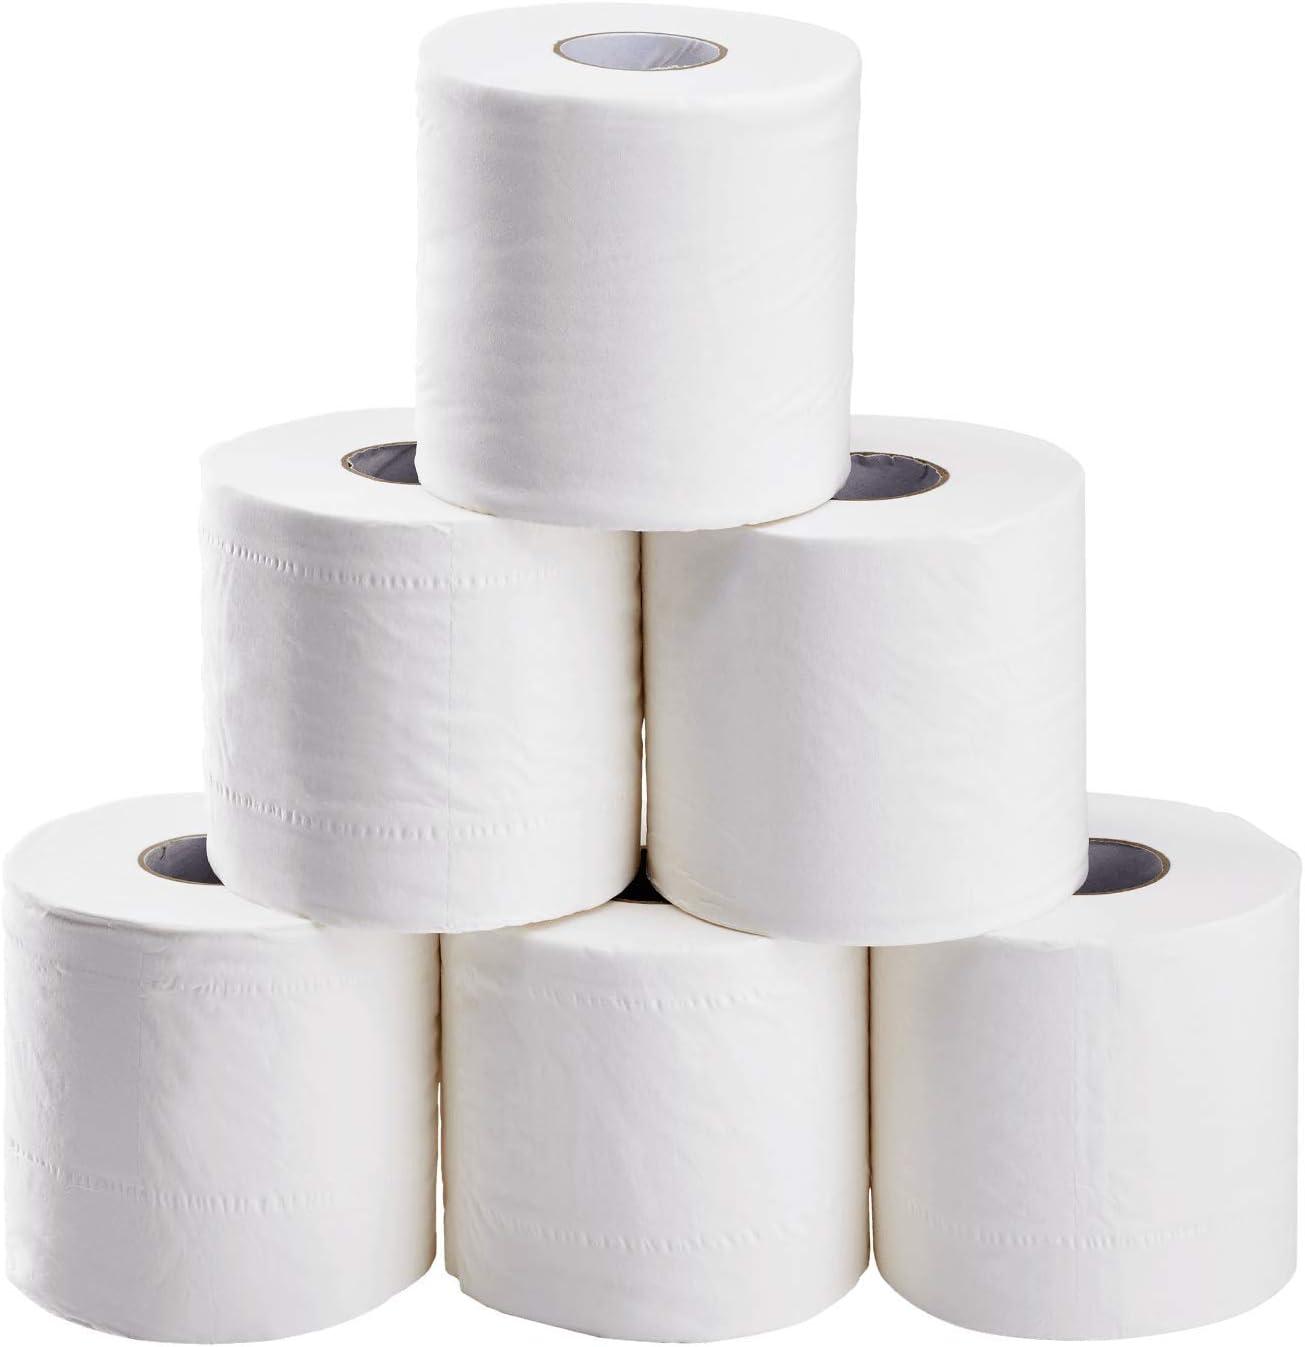 Karat 2-ply Toilet Tissue Roll - Rolls Seasonal Wrap Introduction Sheets 48 400 Max 83% OFF